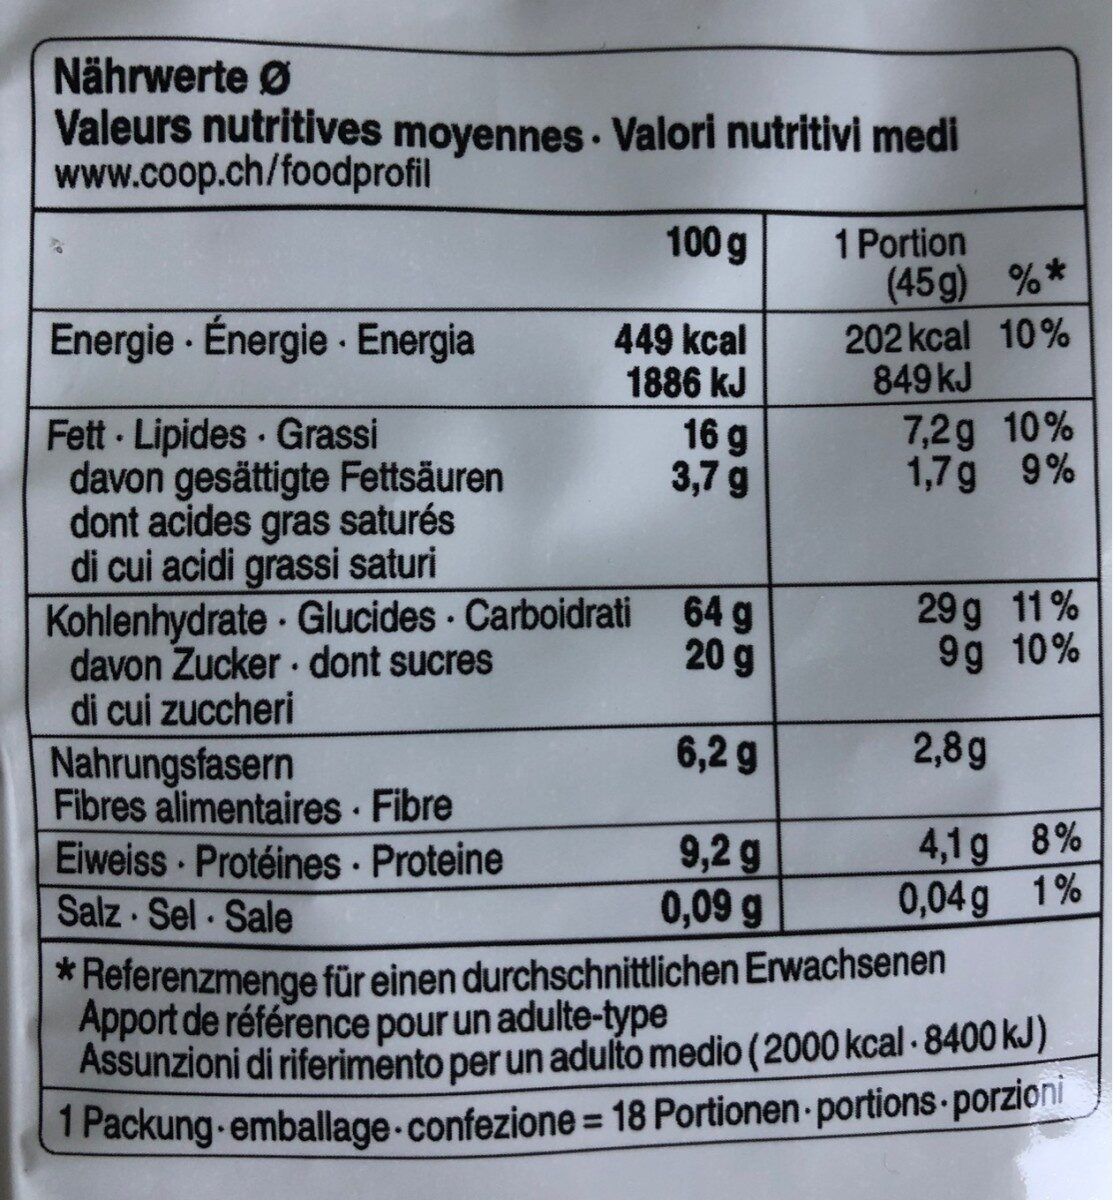 Muesli croquant au chocolat - Informazioni nutrizionali - fr